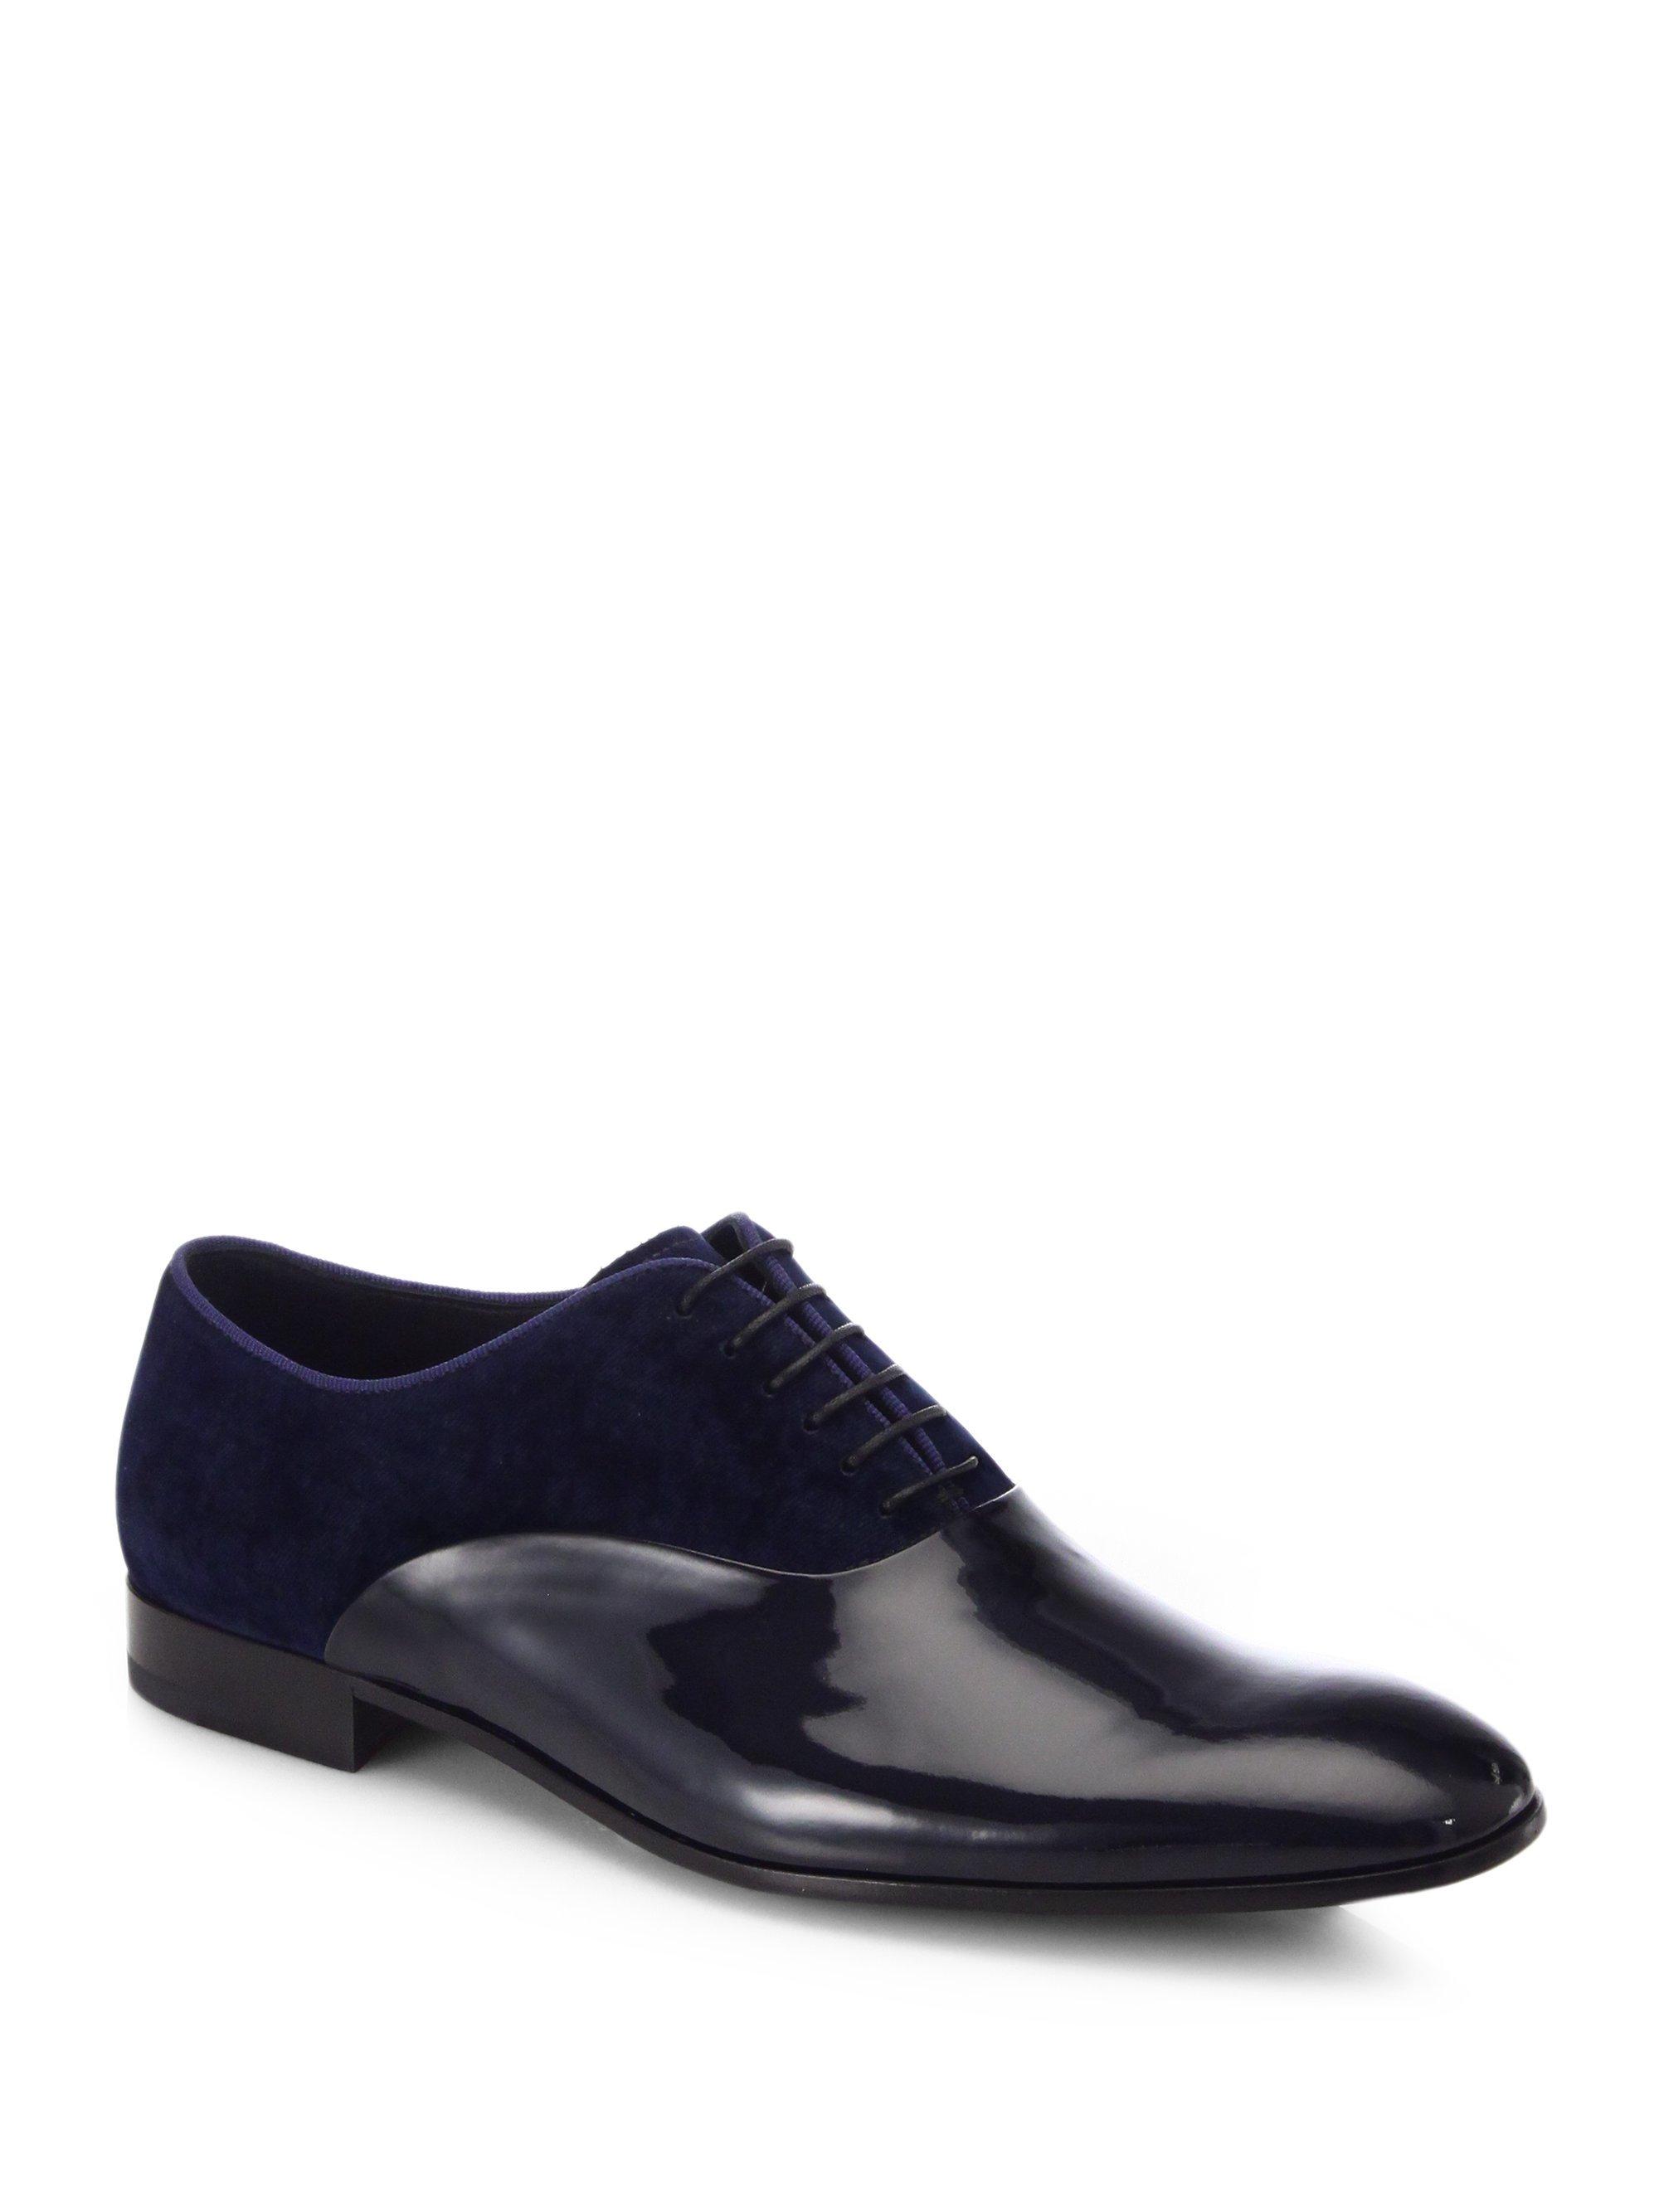 Giorgio Armani Patent Leather U0026 Velvet Oxfords In Blue For ...